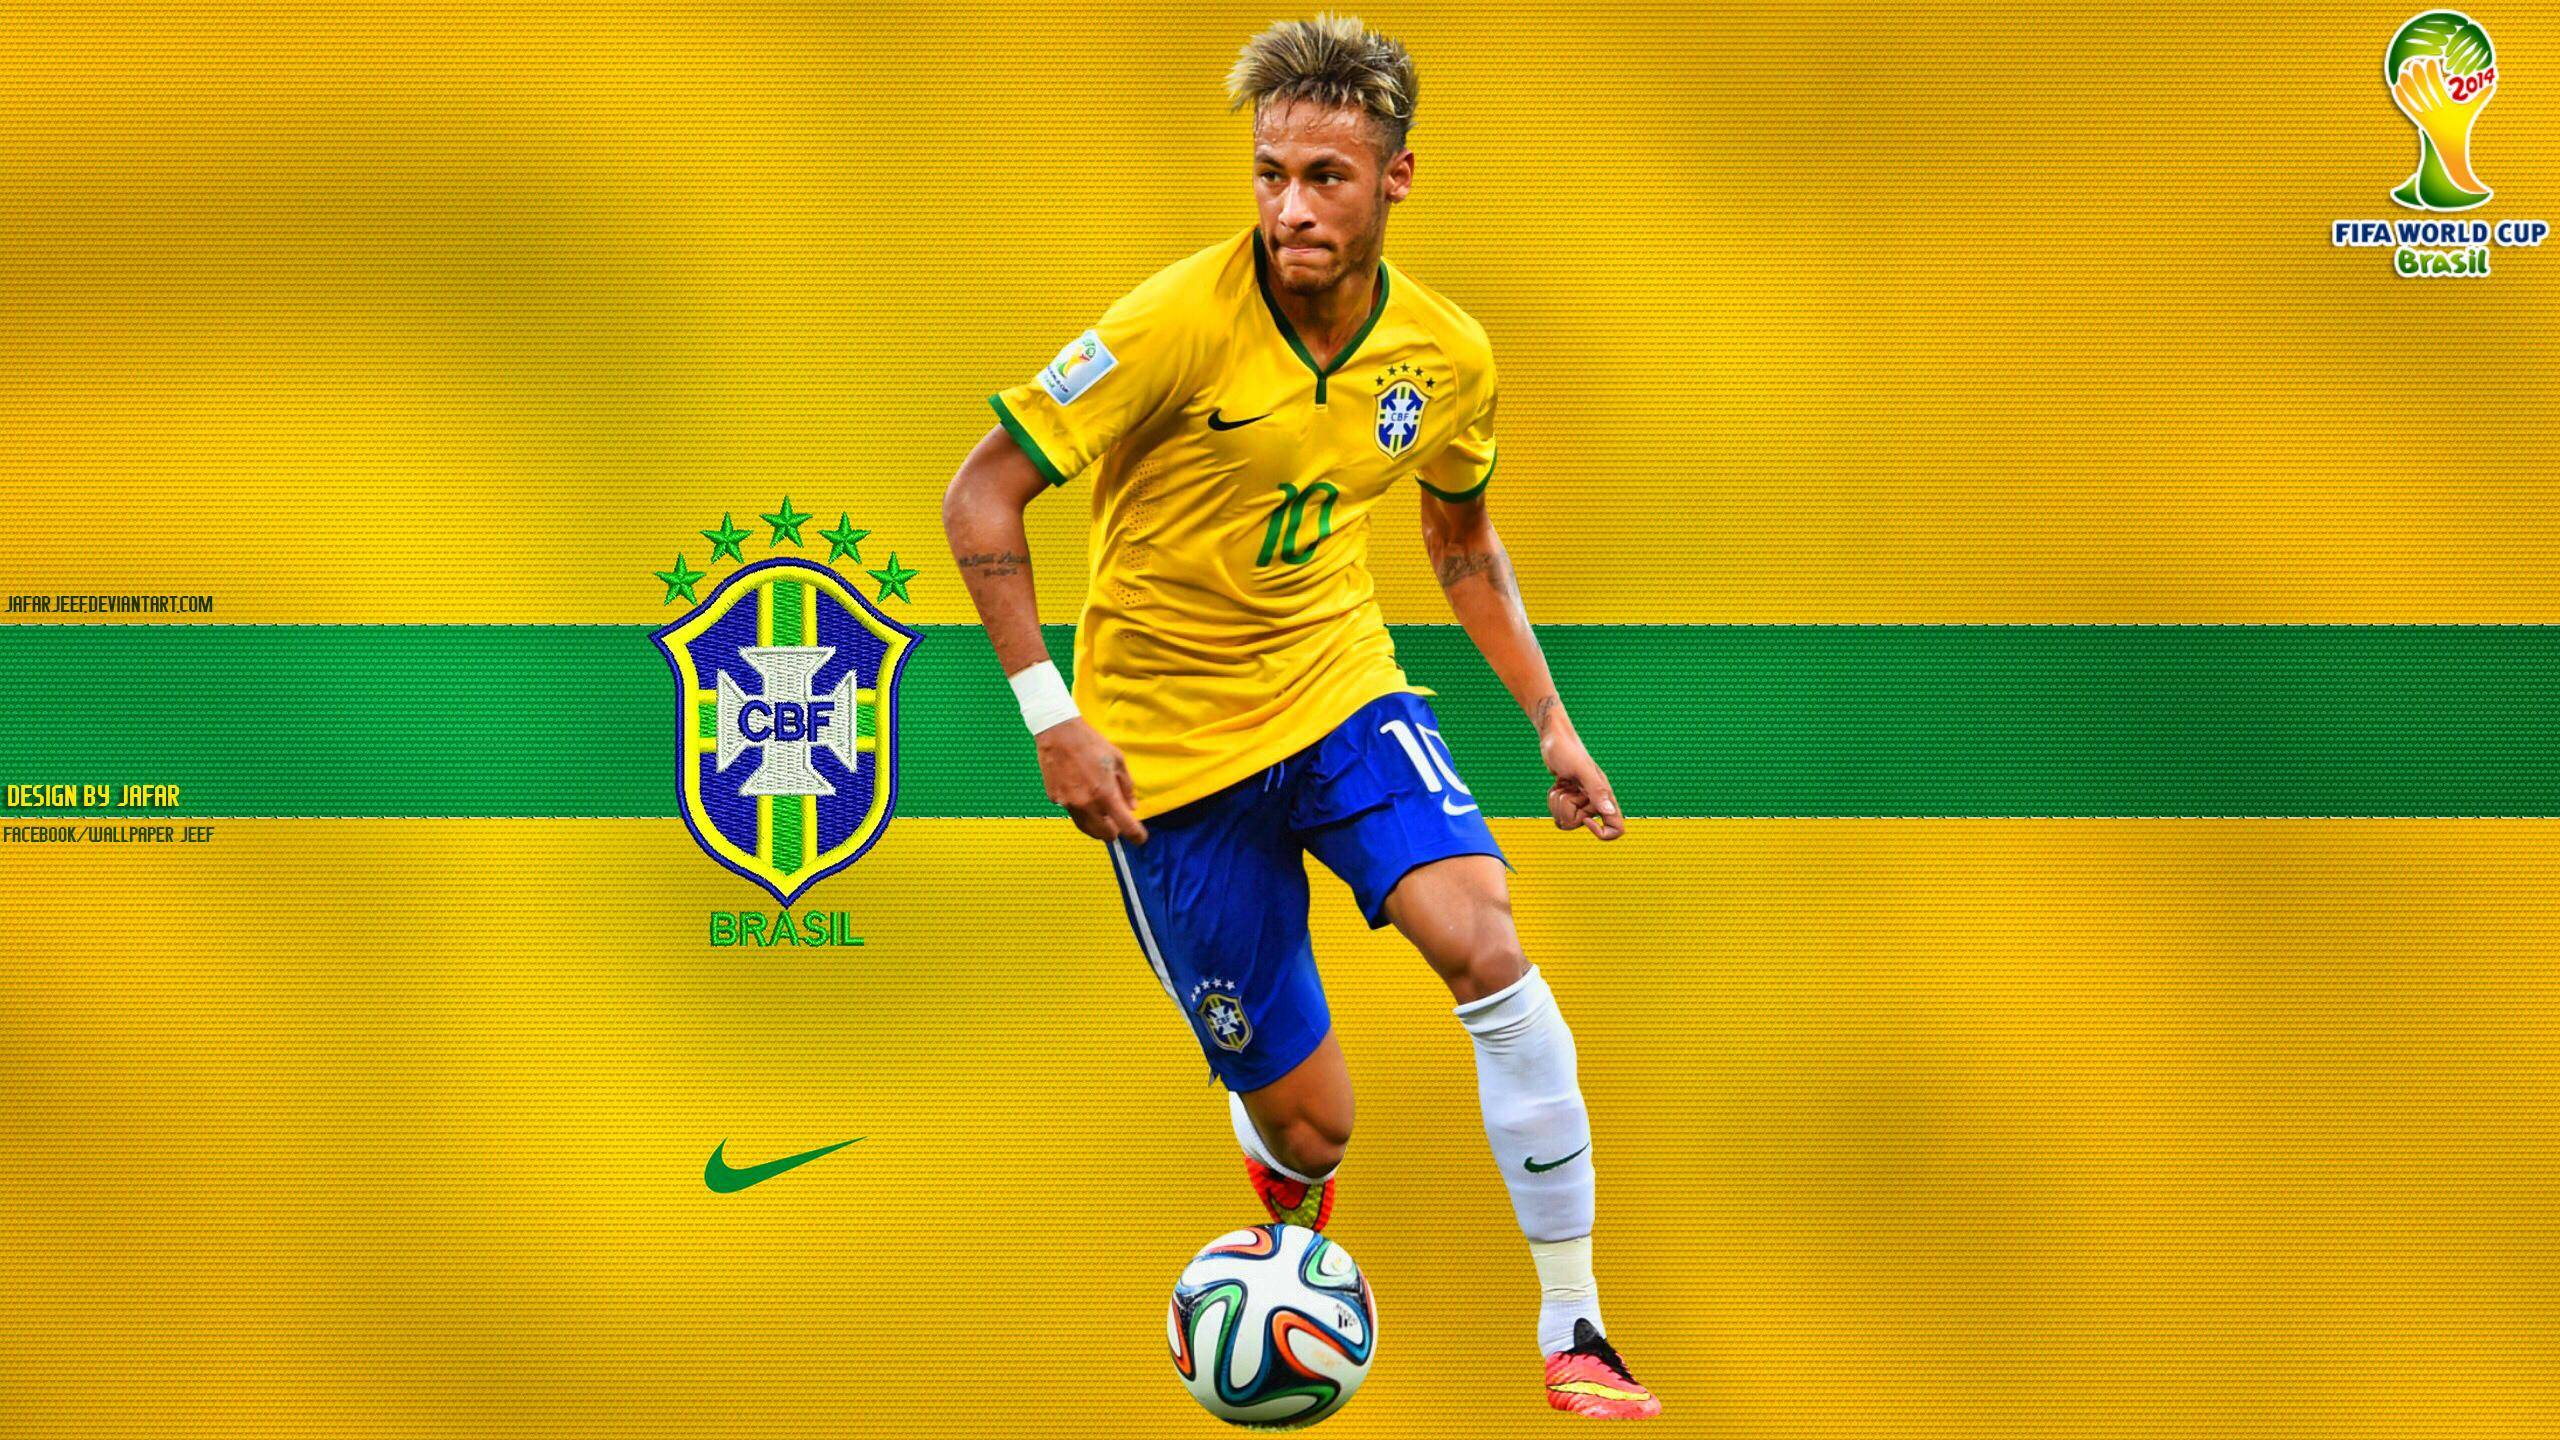 Neymar will not skipping Brazi